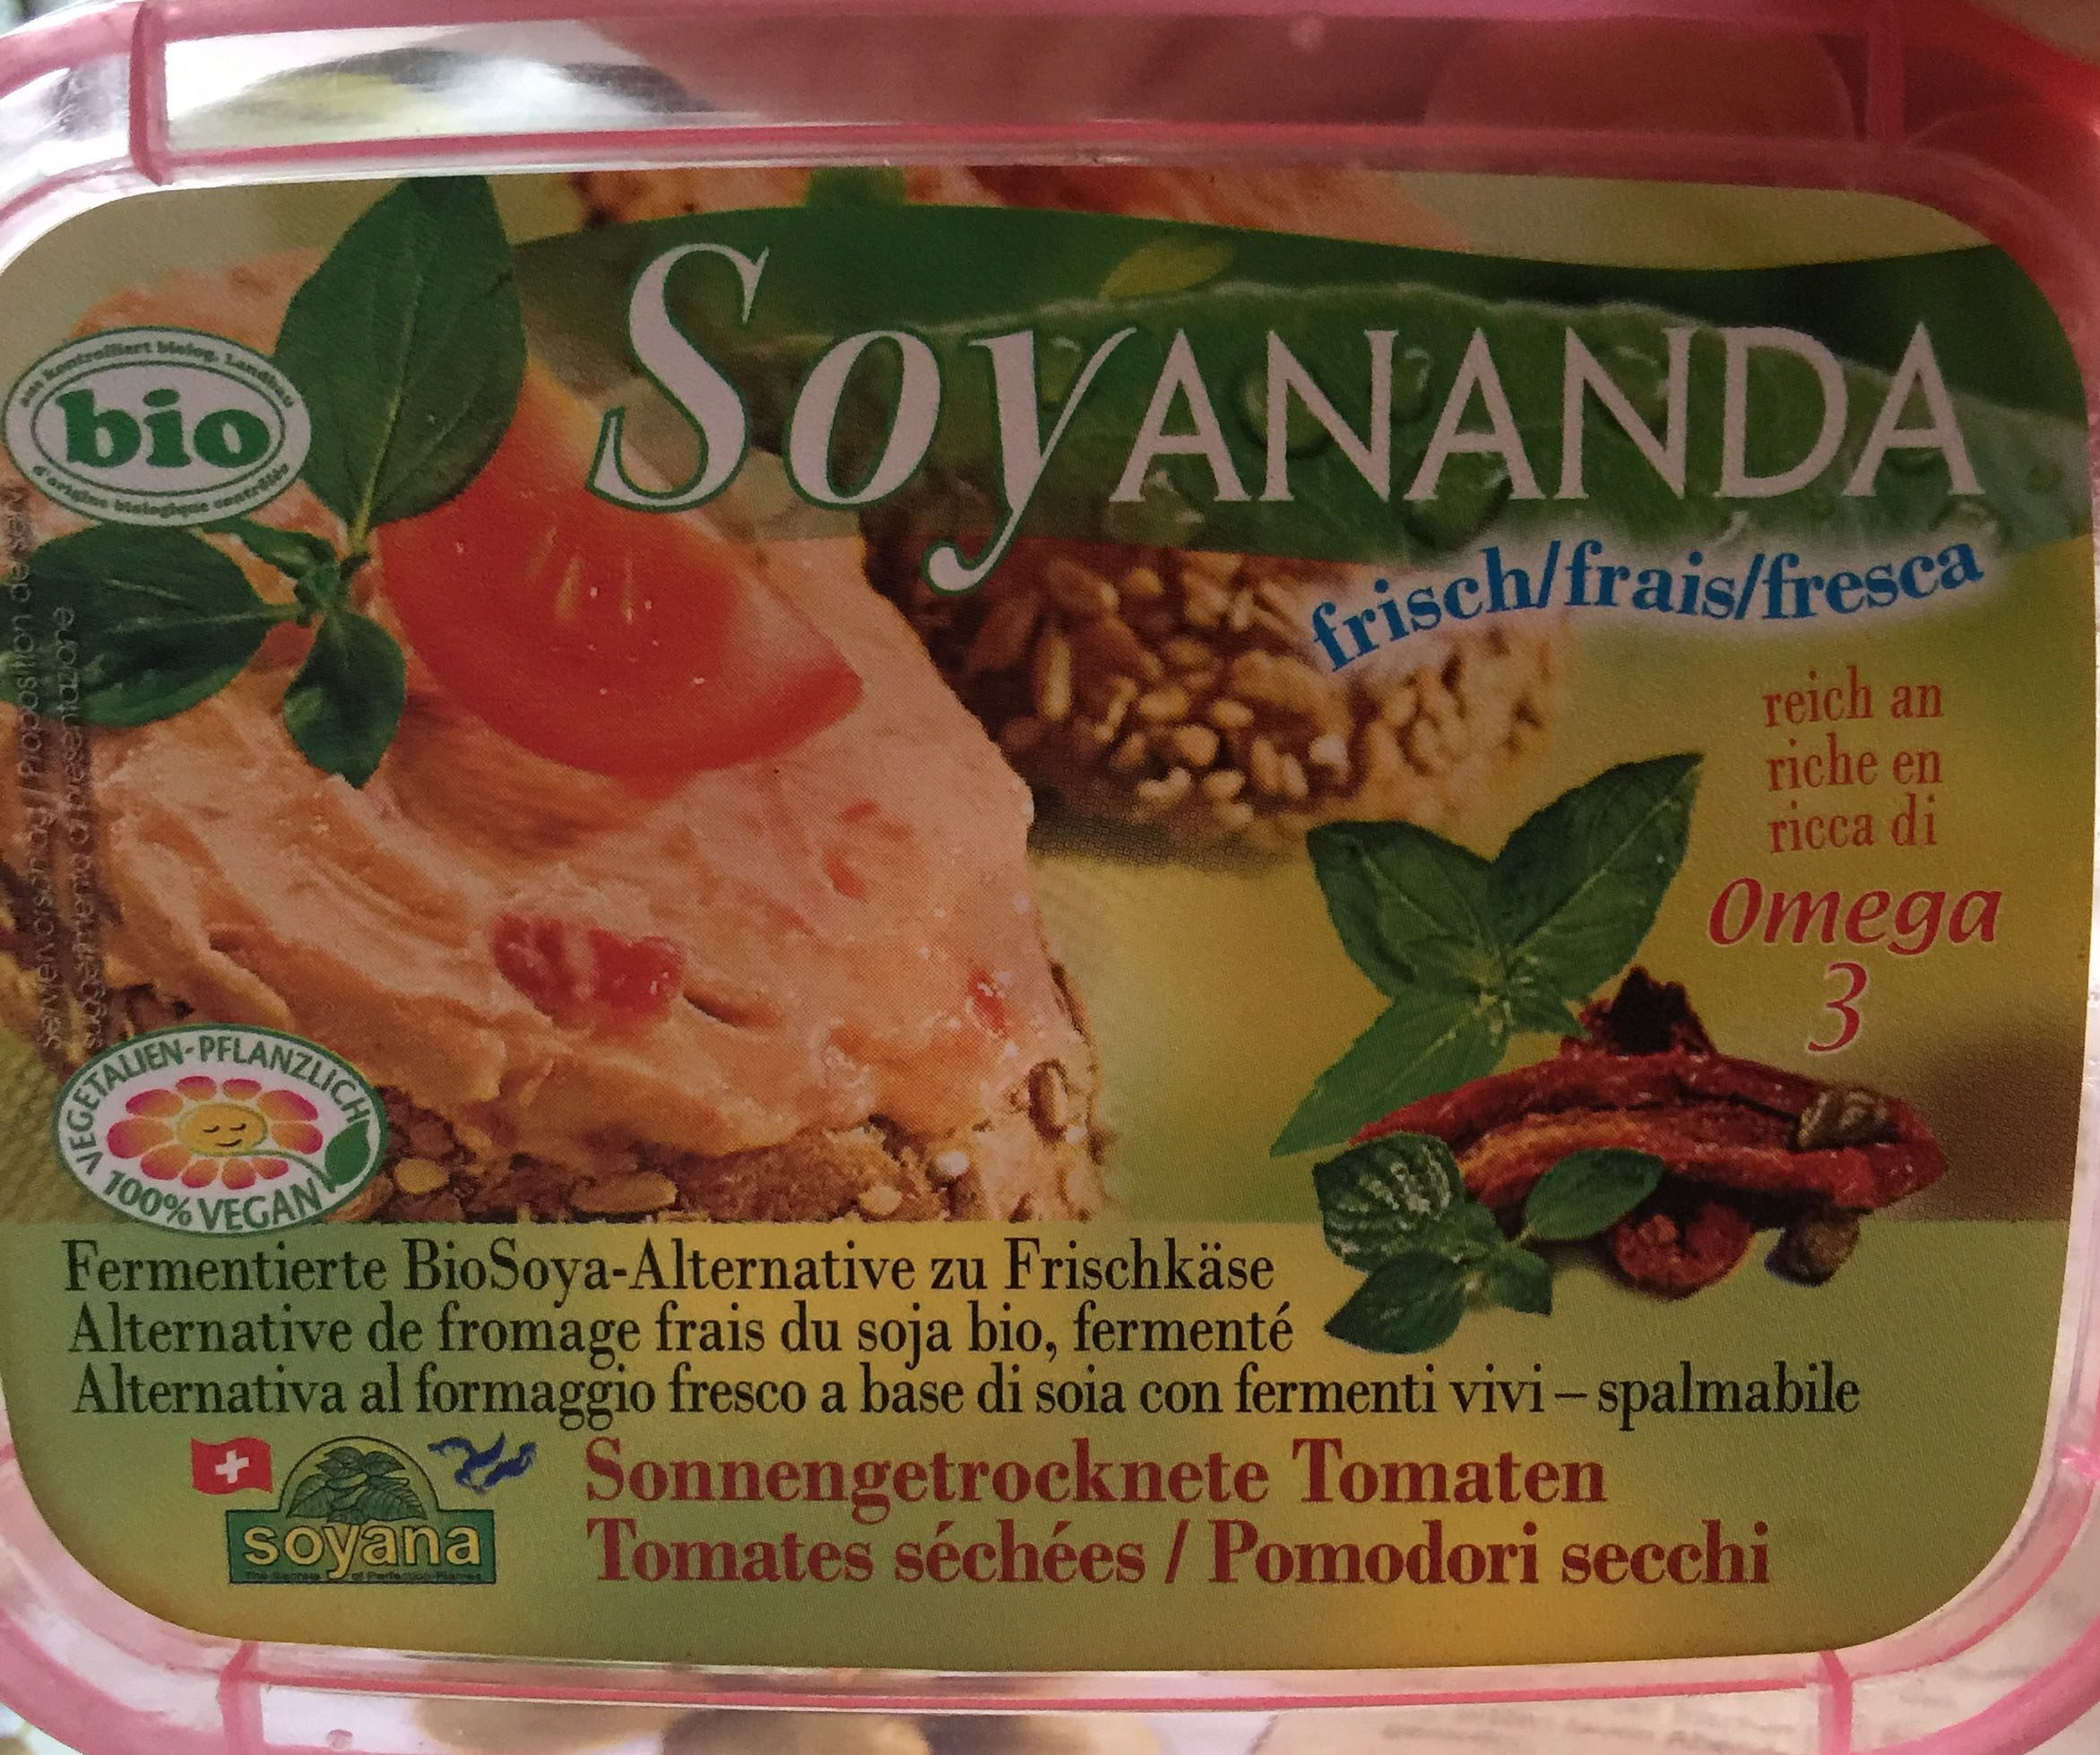 Soyananda frais omega 6 tomates séchées - Product - fr